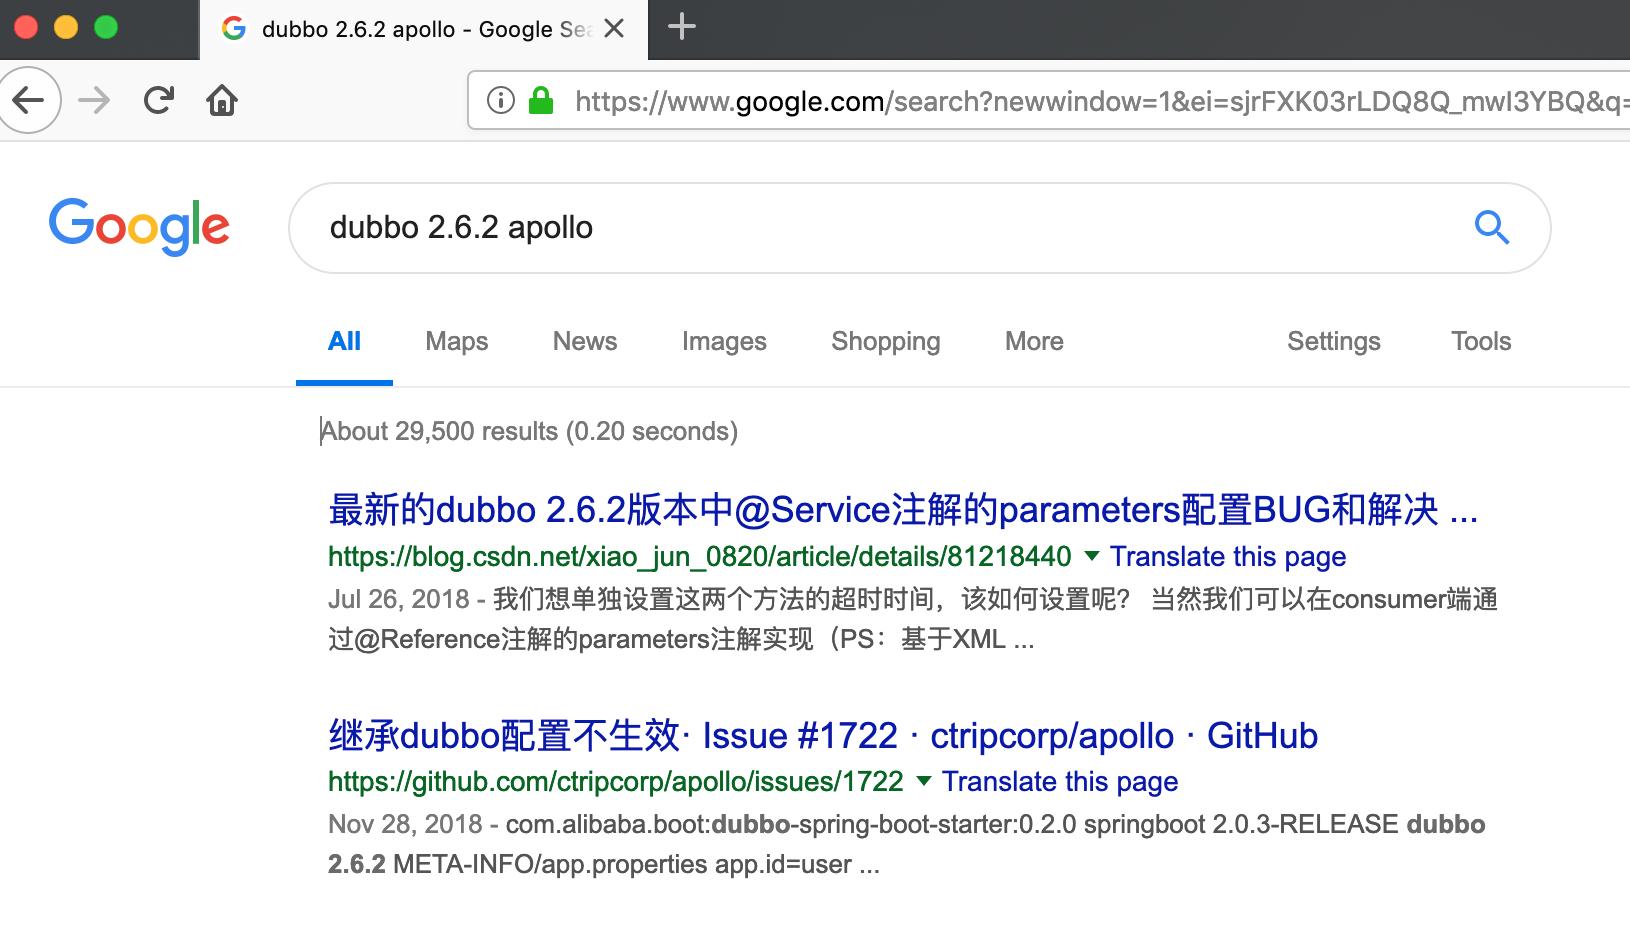 Spring Boot接入 apollo 后启动 dubbo 报错 - 小不的笔记